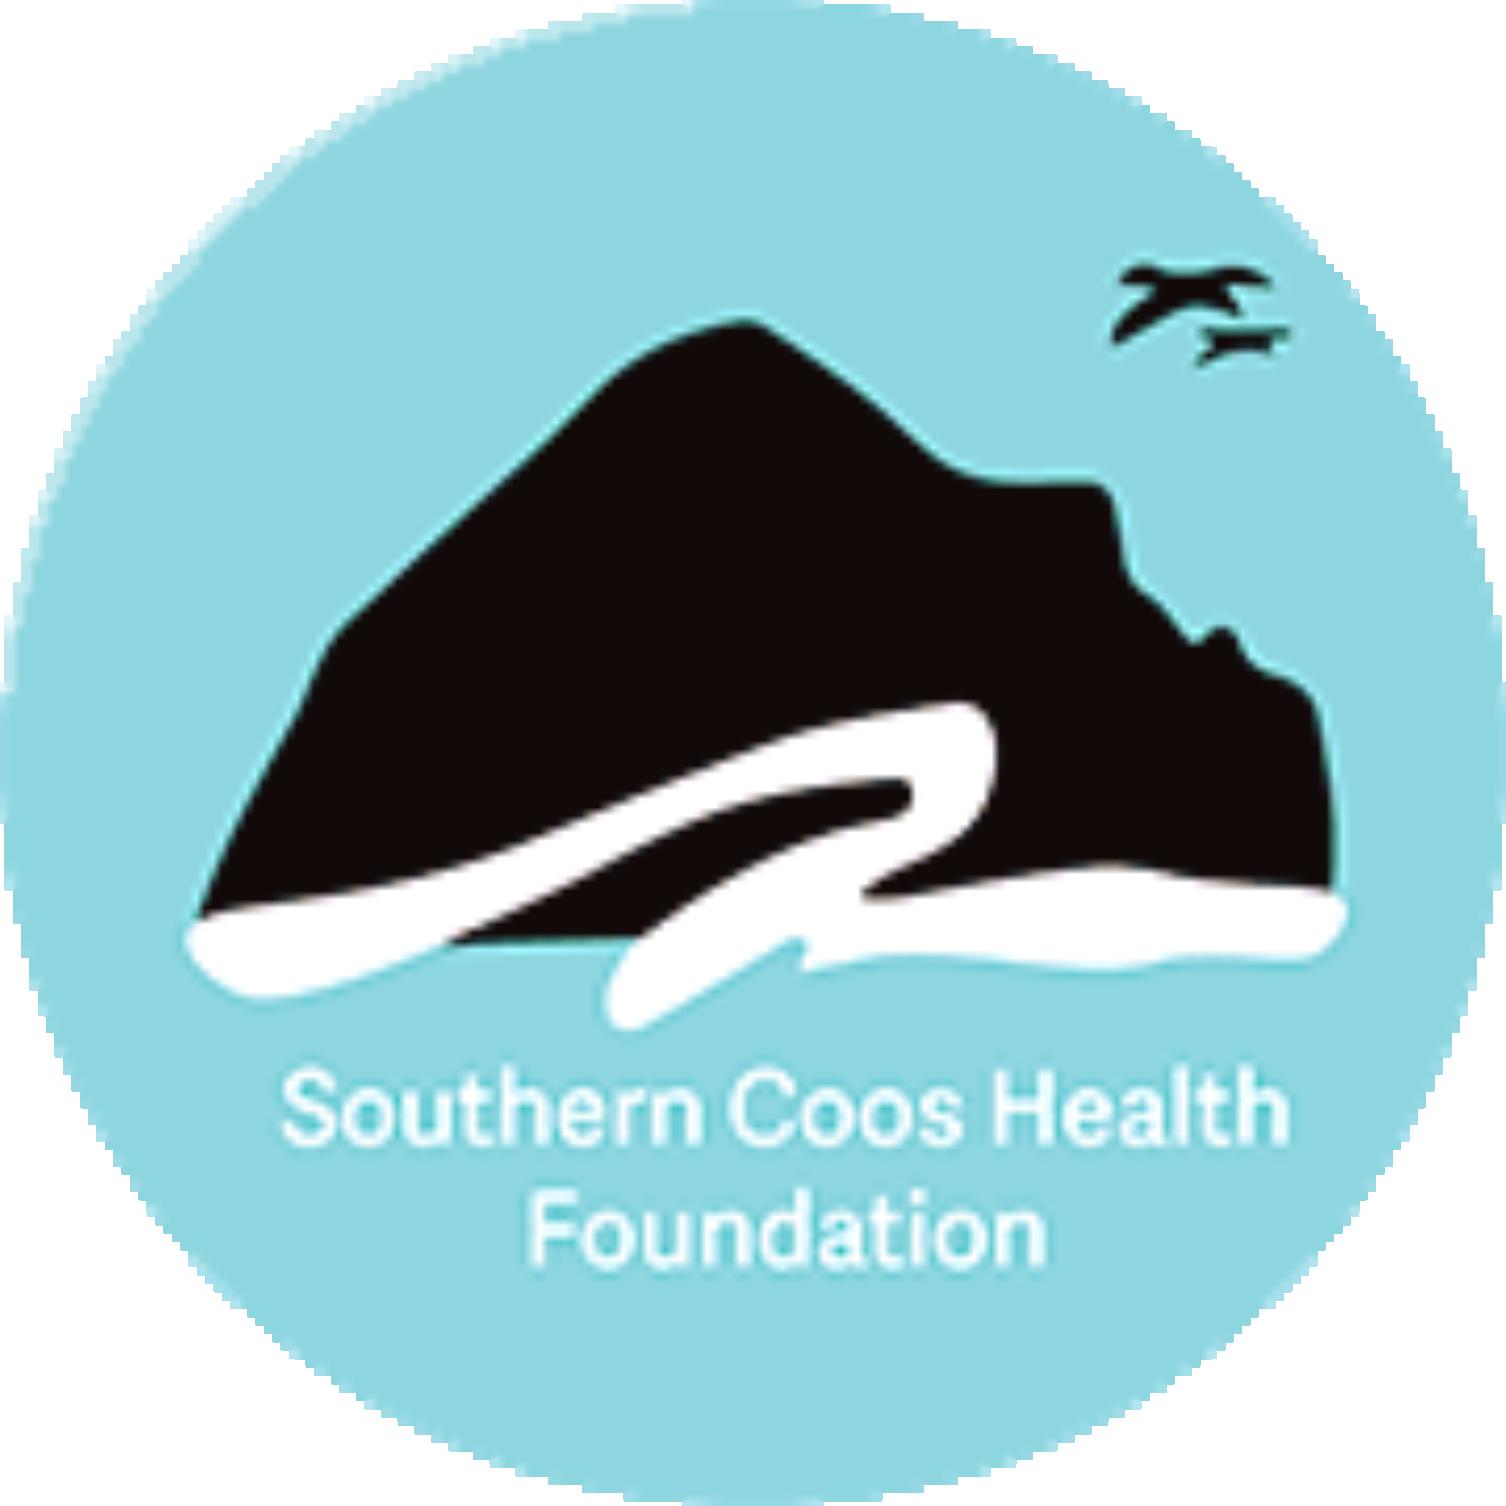 Southern Coast Heath